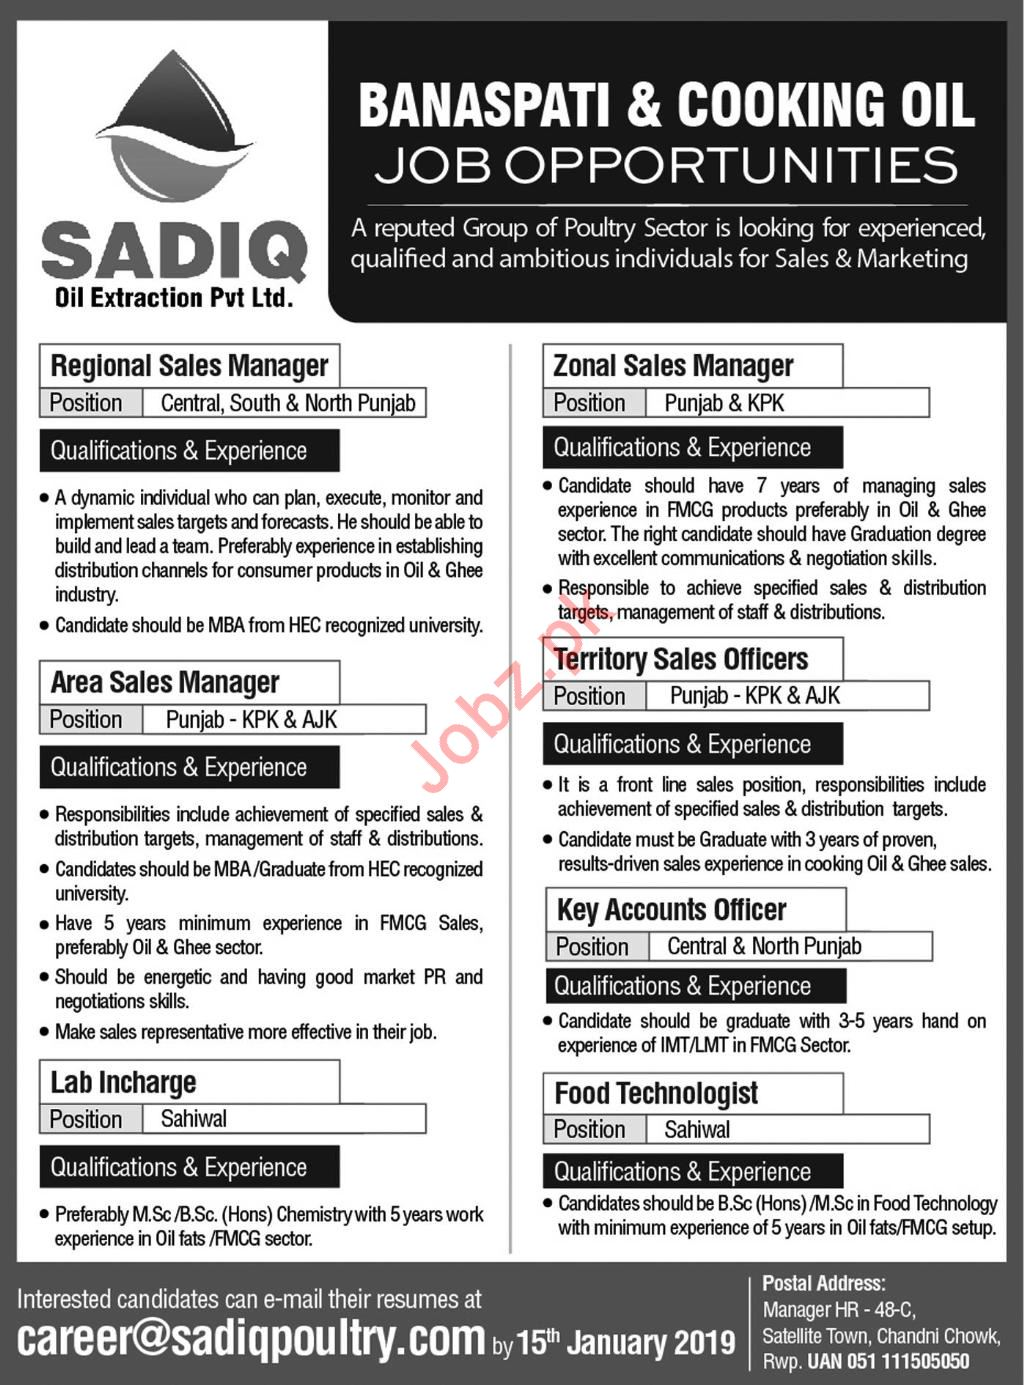 Sadiq Oil Extraction Pvt Limited Jobs 2019